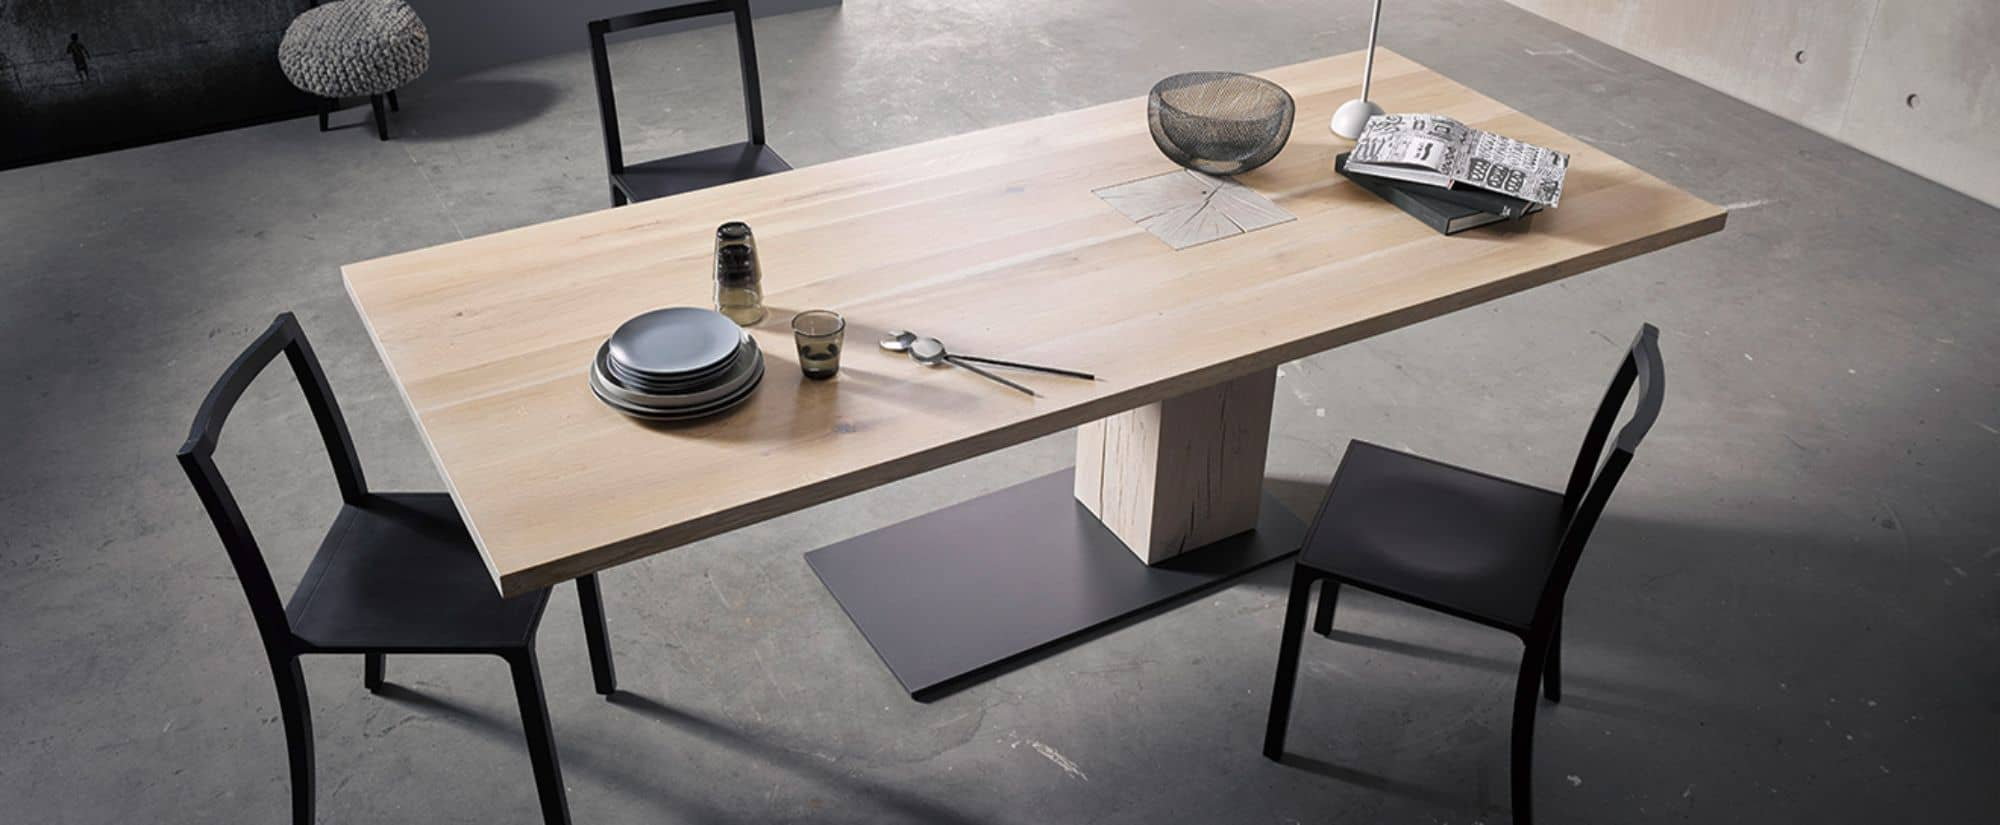 KFF asymetric table